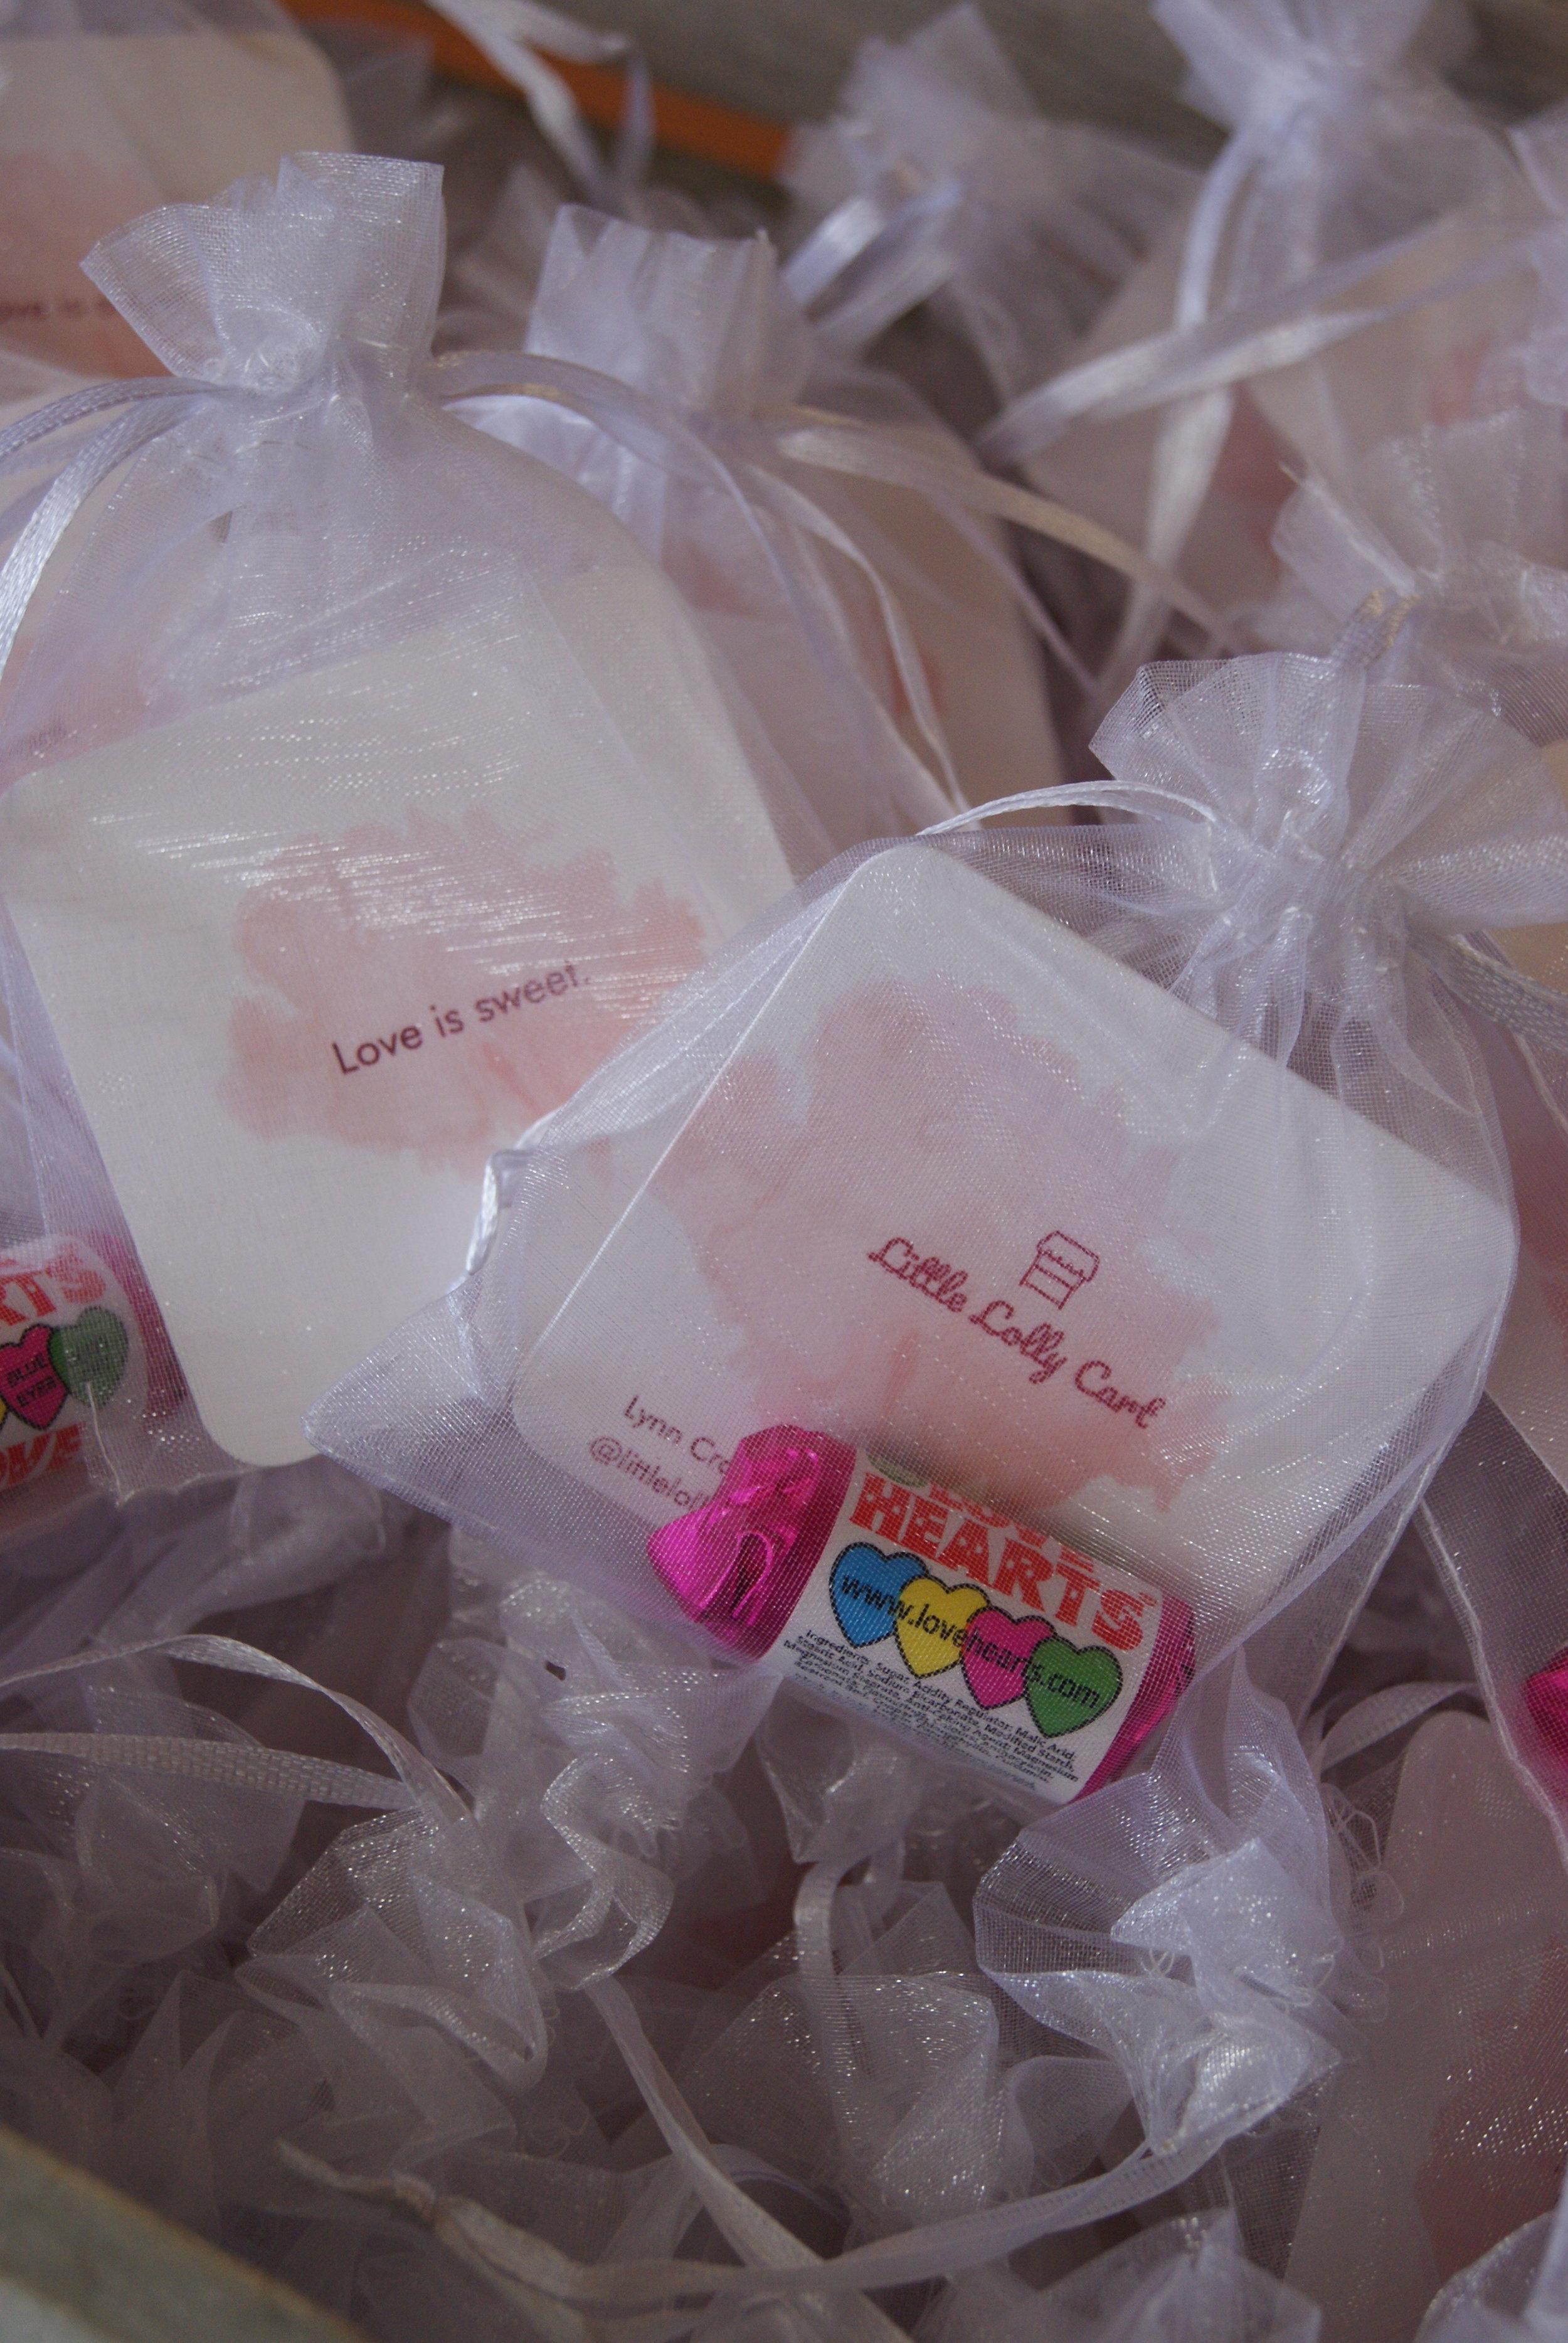 Wedding_expo_handout_bags.JPG